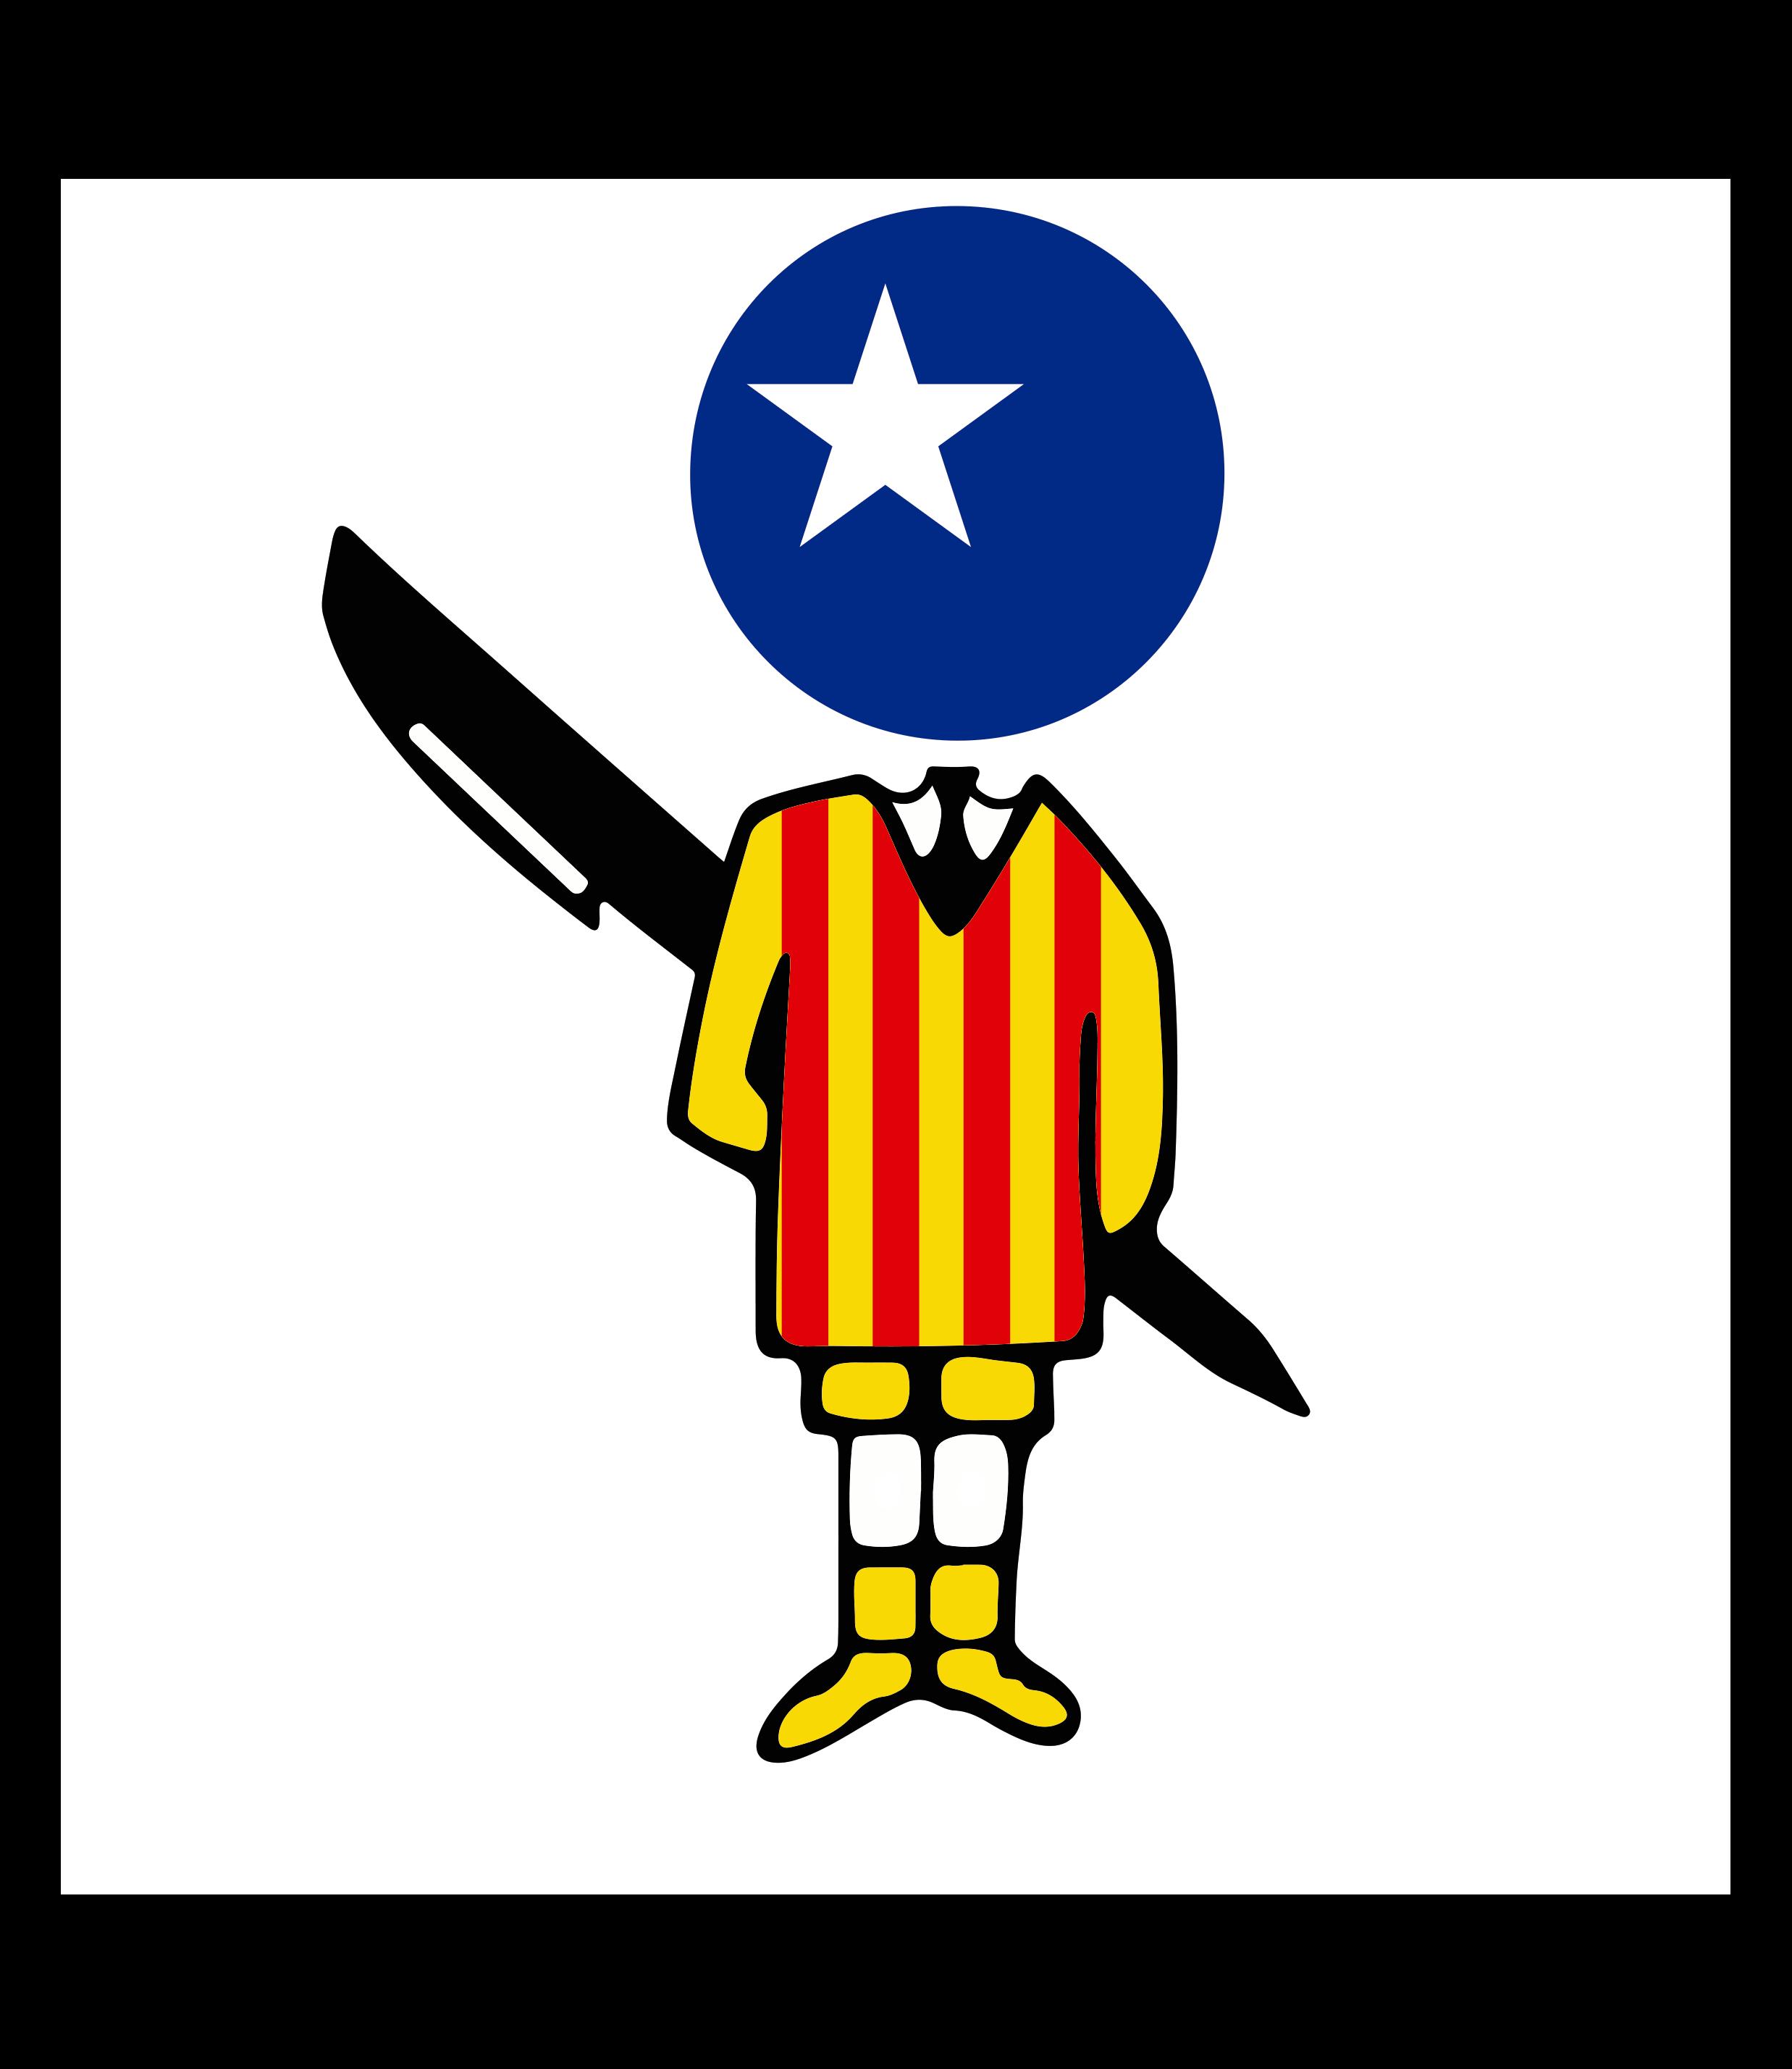 Jordi Magrià